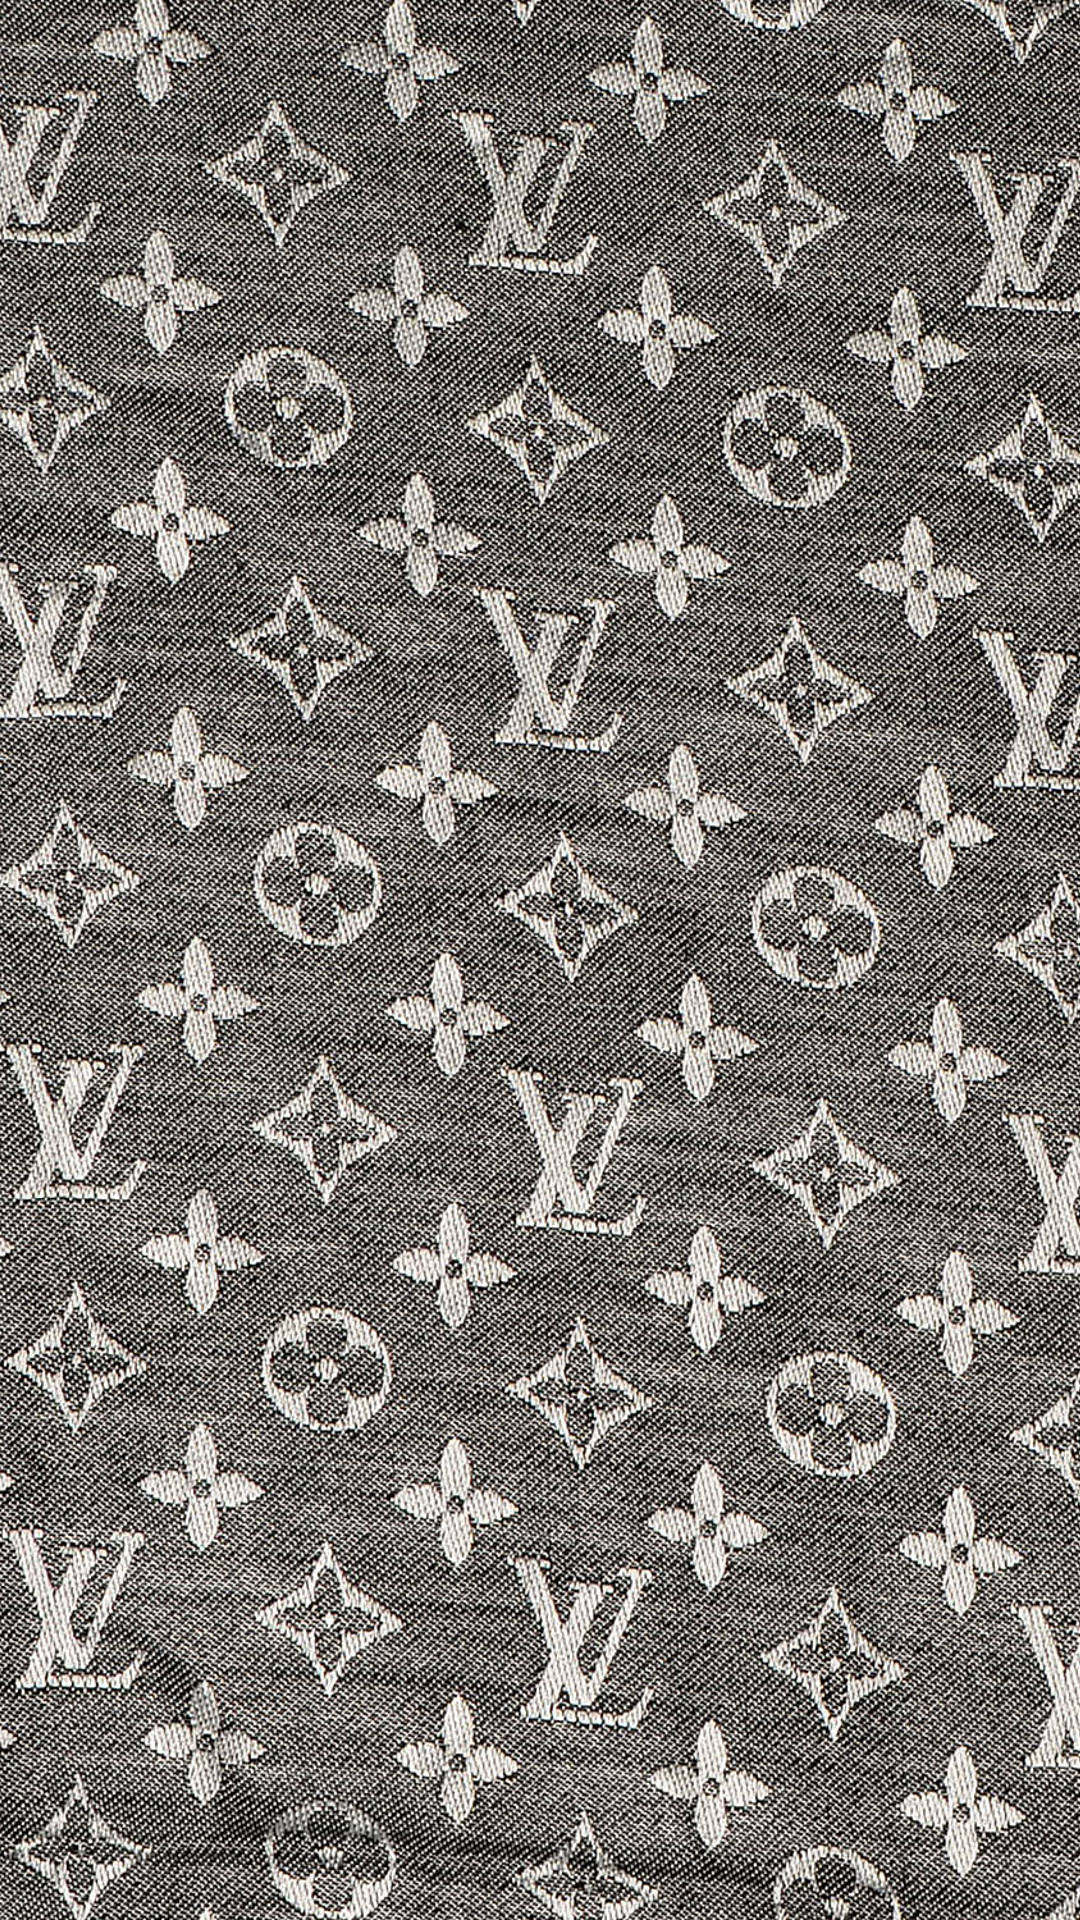 louisvuitton i04 - LOUIS VUITTON[ルイ・ヴィトン]の高画質スマホ壁紙20枚